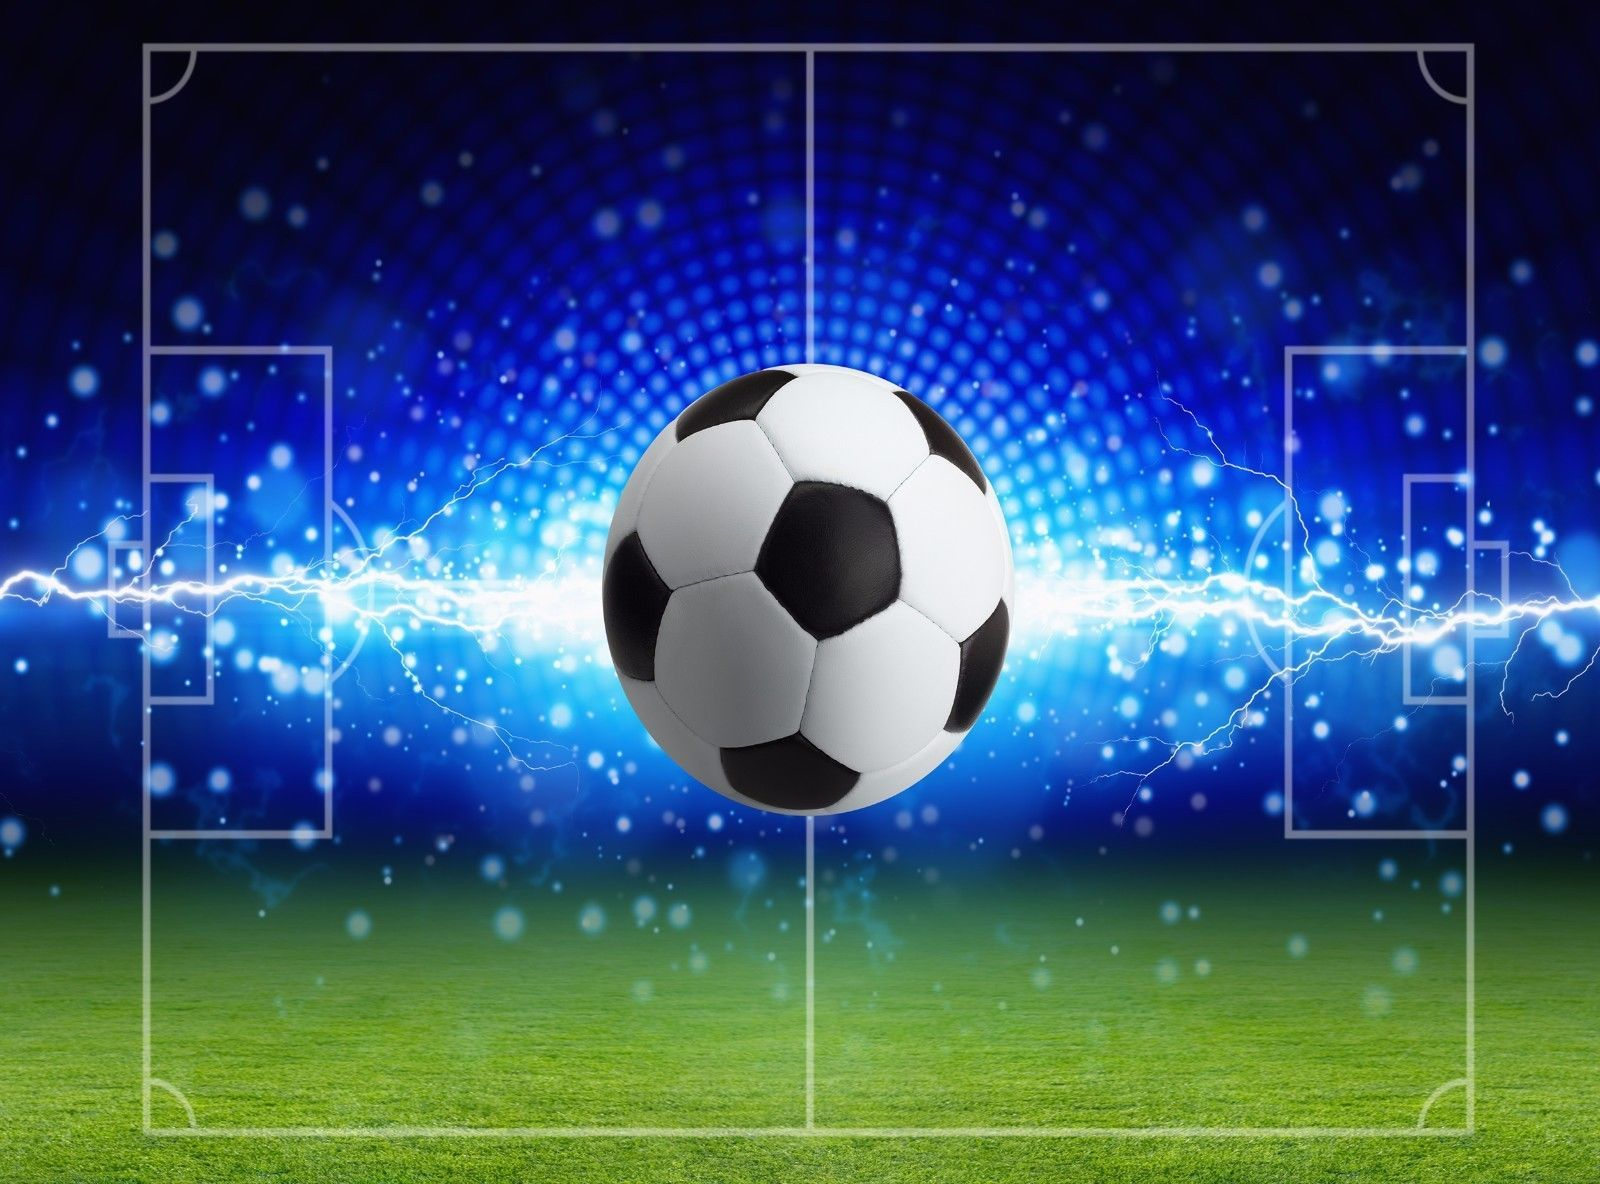 81c8dcb6 Soccer Background Photo Wallpaper Wall Mural DECOR Paper Poster Wall art  7104699460138 | eBay